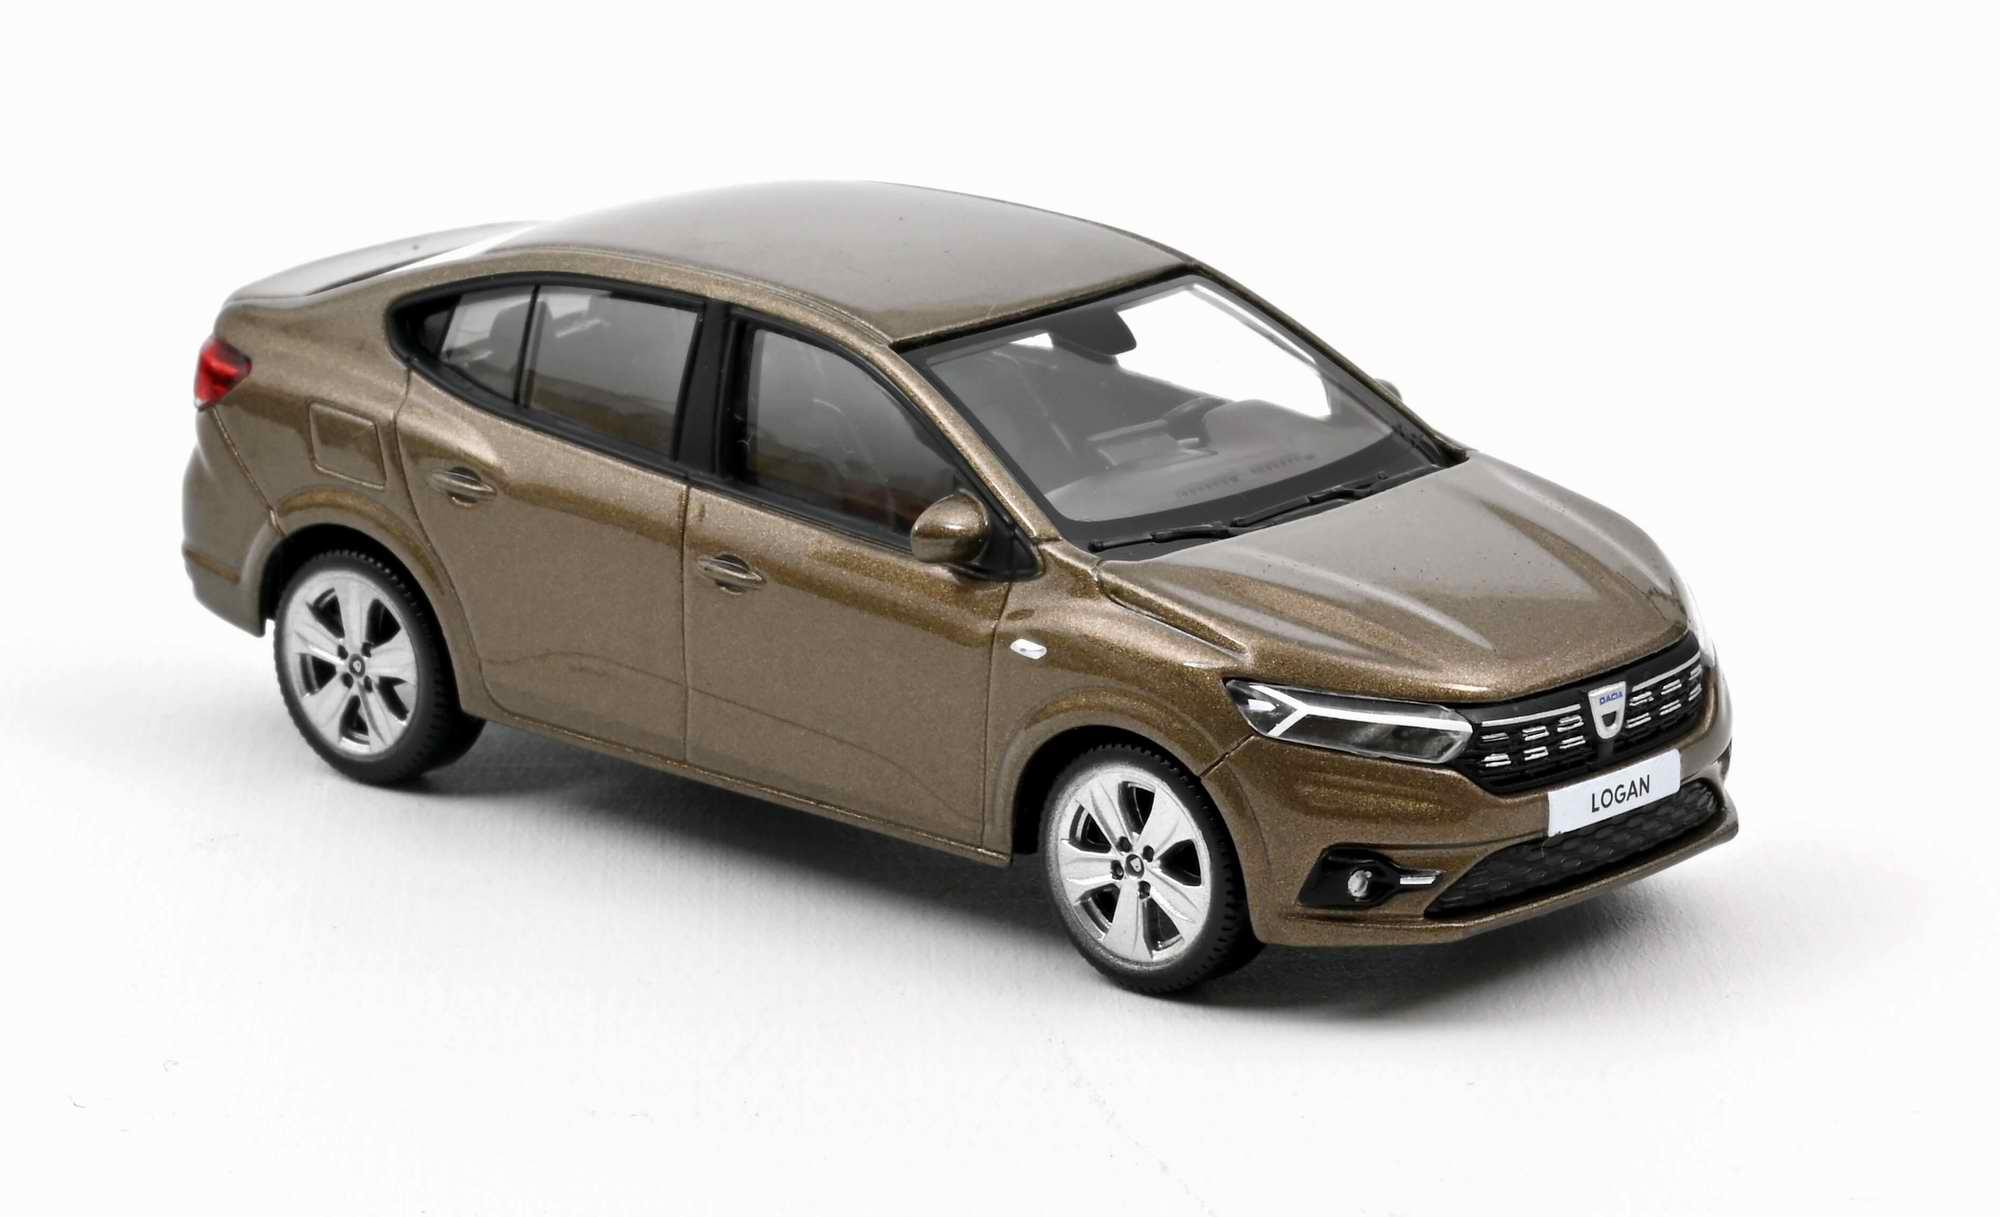 Voiture miniature Dacia logan 2021 marron vison NOREV 1/43